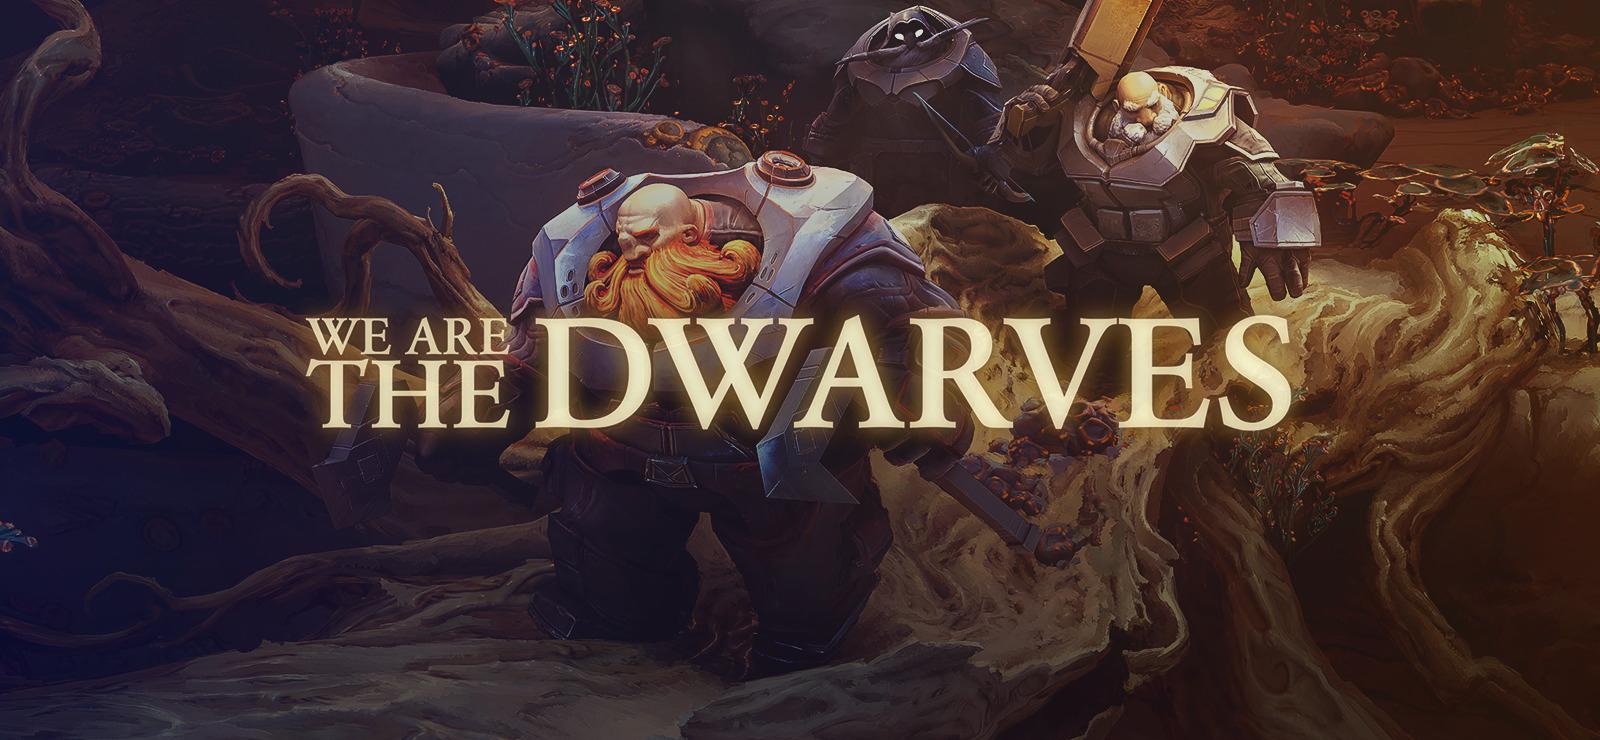 We are the Dwarves Computerspel goedkoper